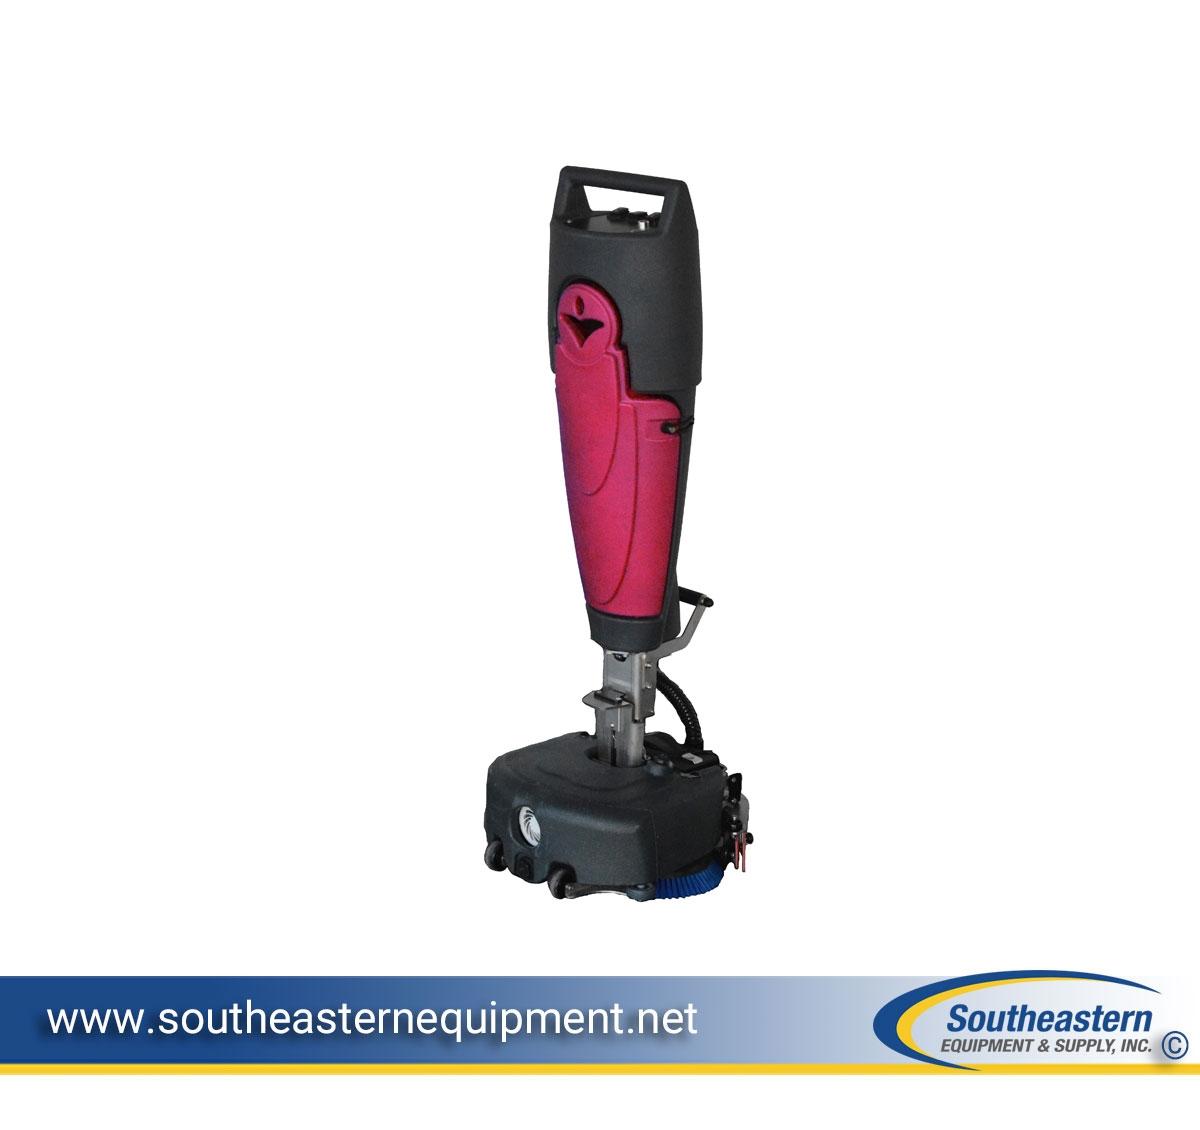 en minuteman behind floors company high product ca performance image alt tennant m scrubbers machines floor walk scrubber